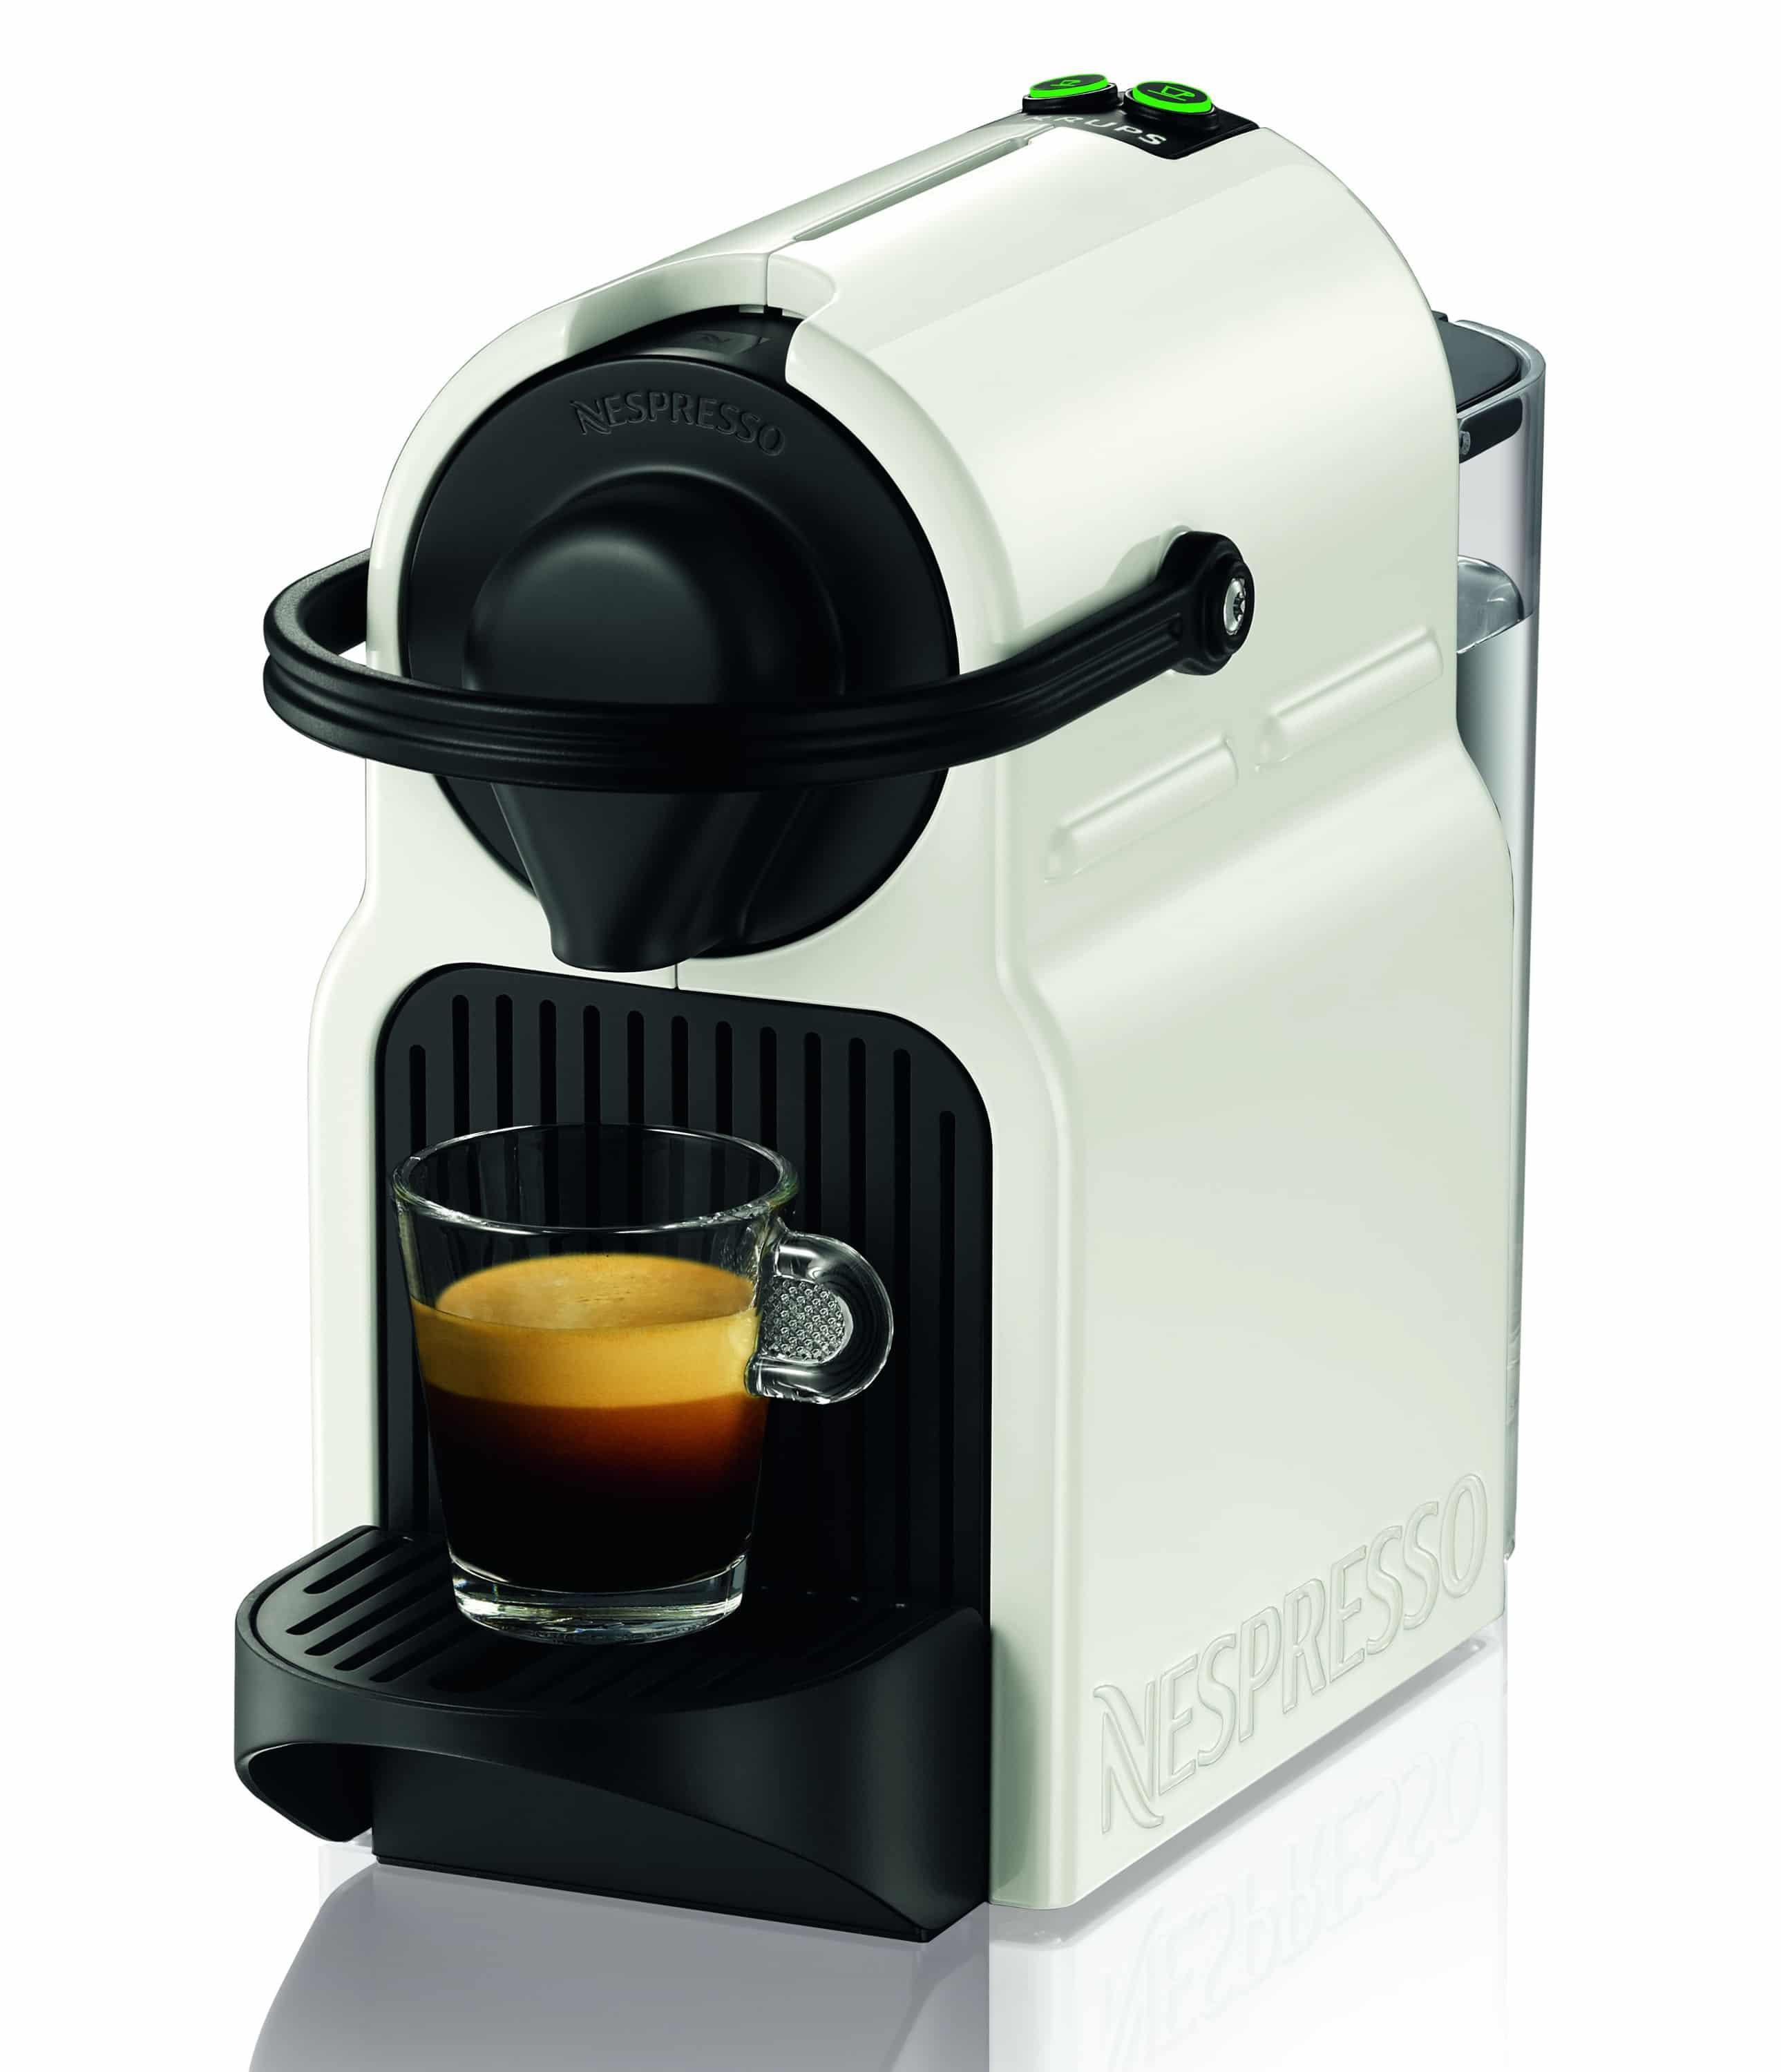 cafetiere nespresso avis